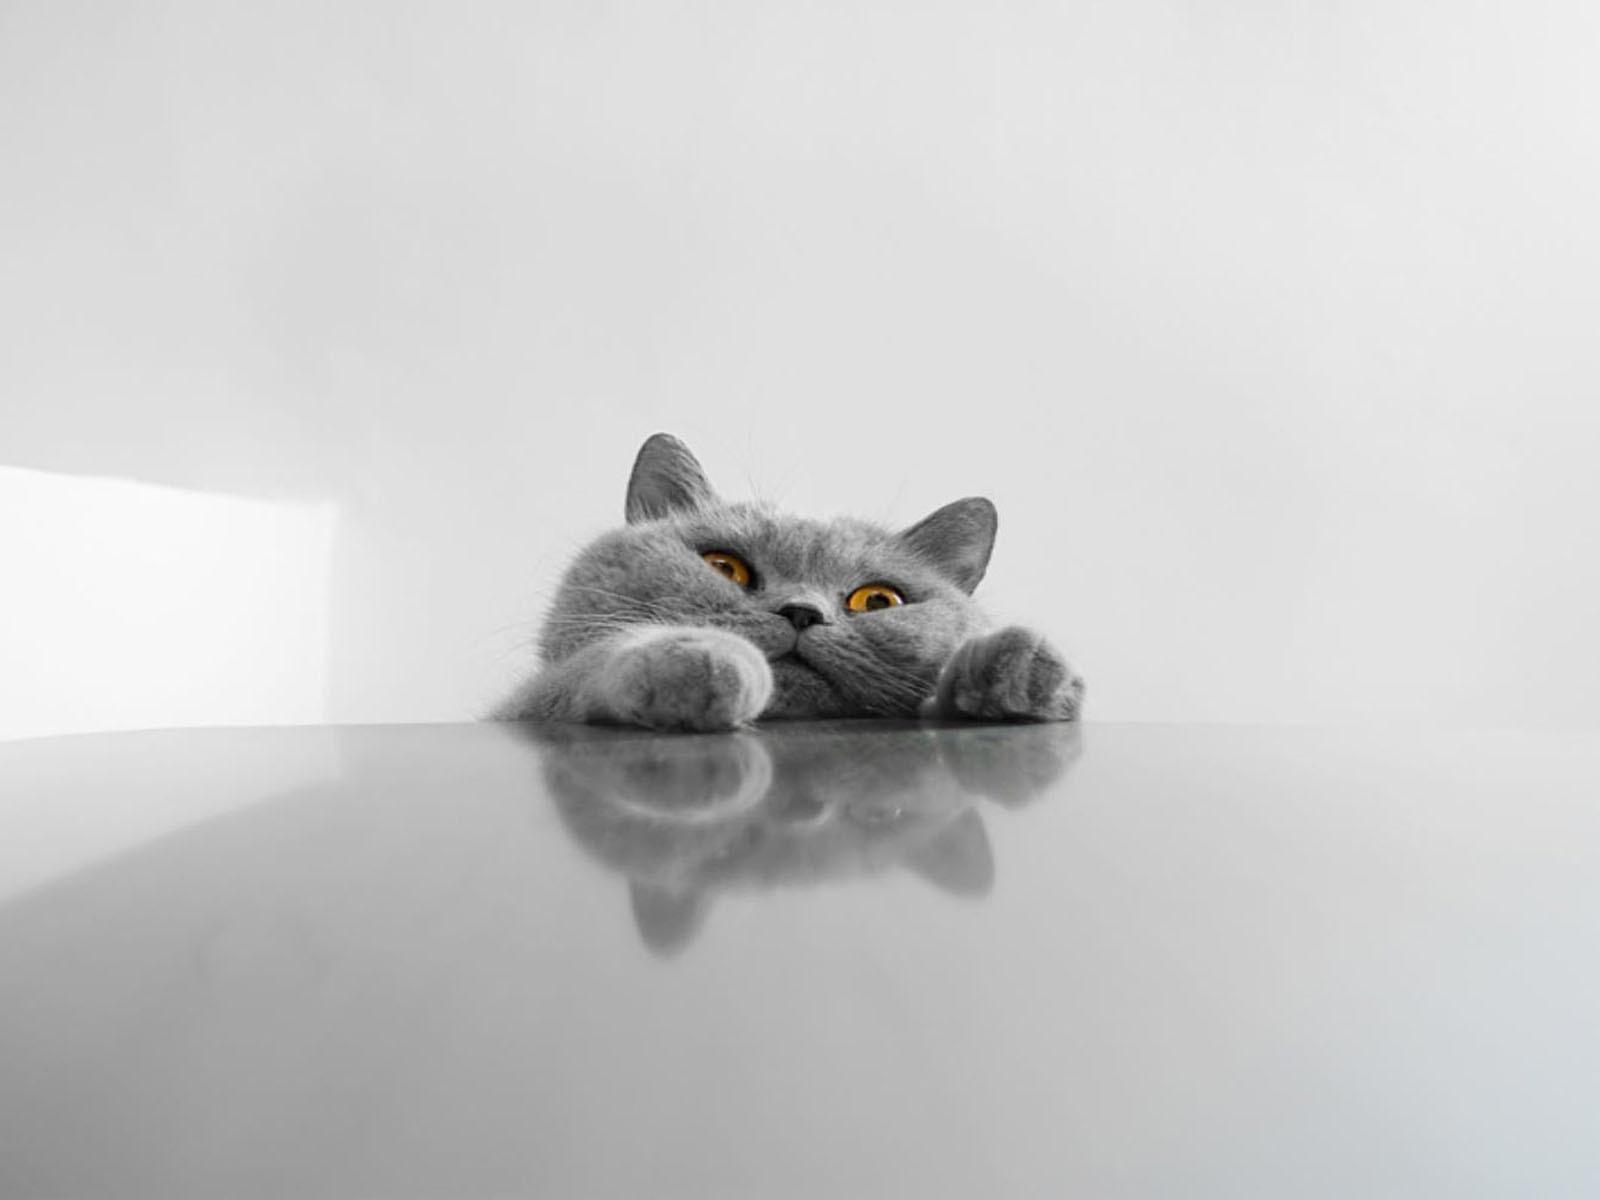 Обои на рабочий стол приколы кошек